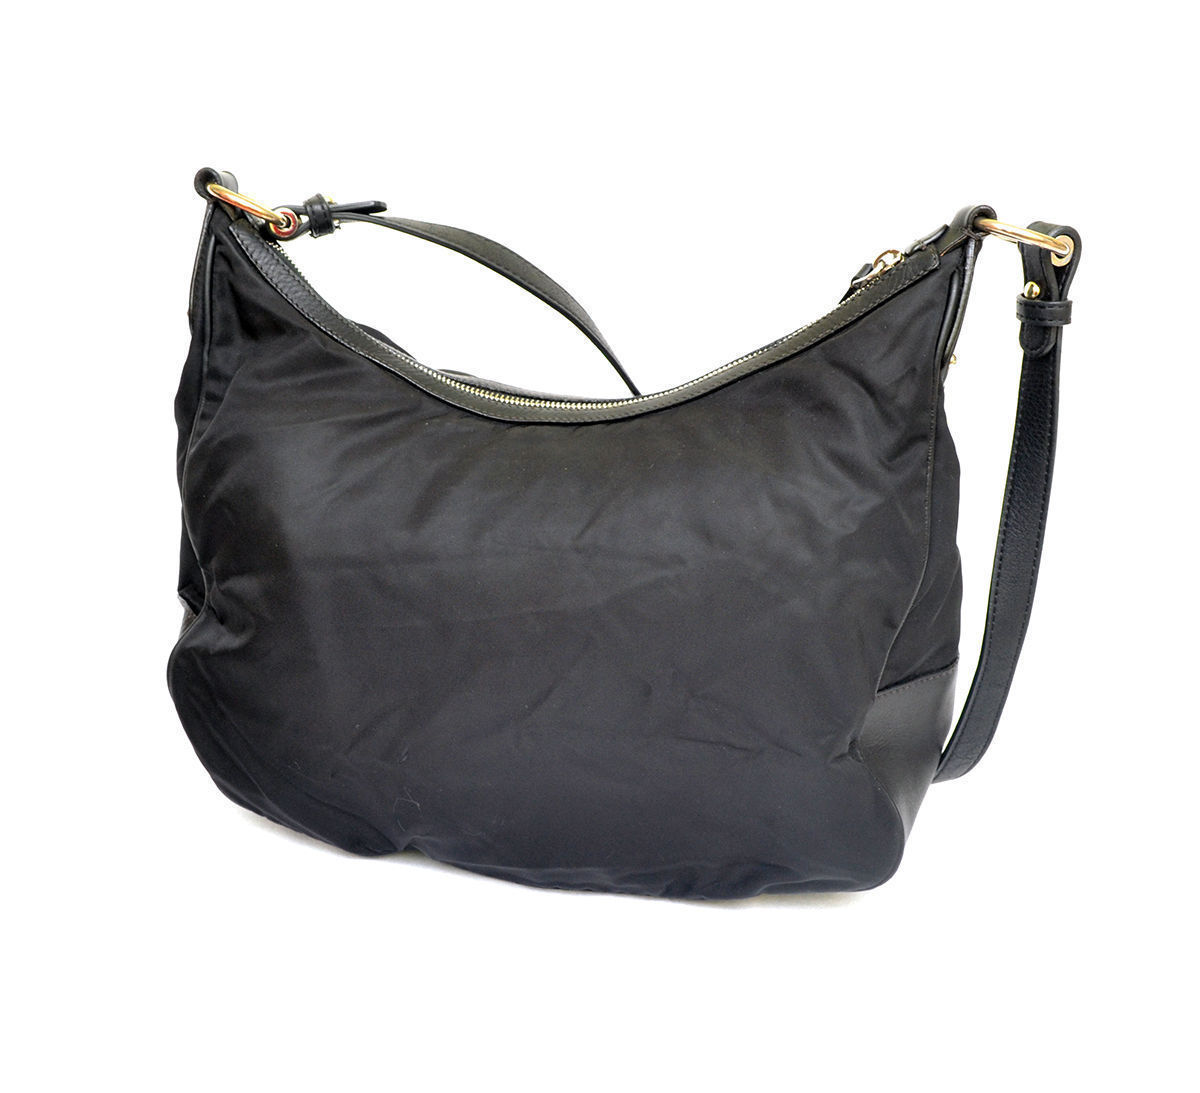 882237050db0 Authentic PRADA Tessuto Nylon Calf Leather and similar items